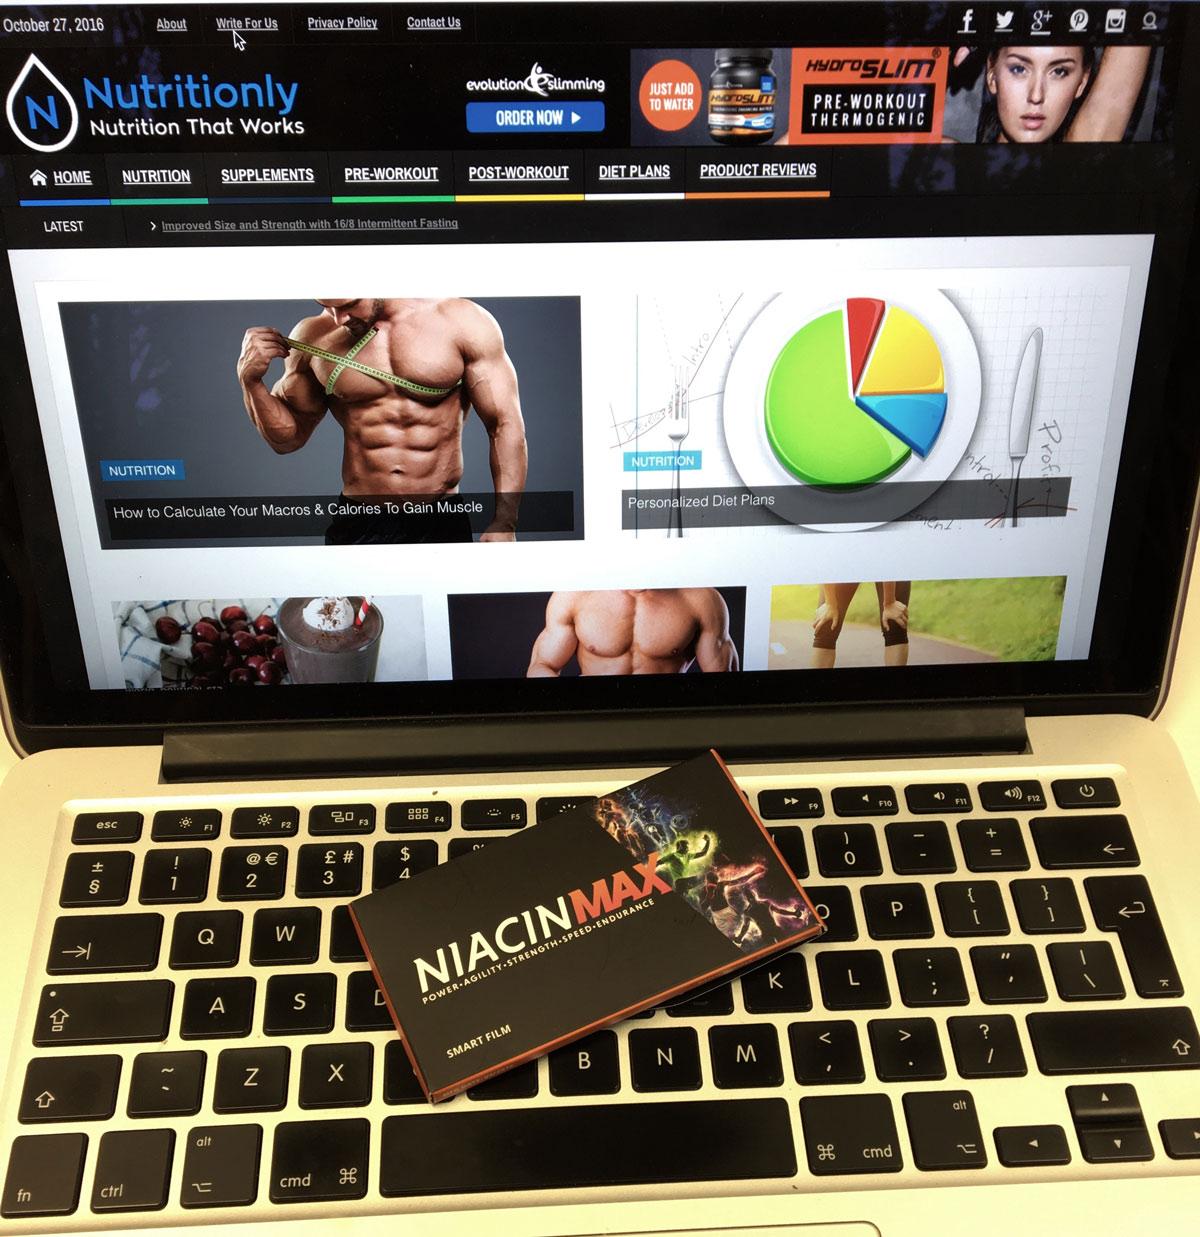 niacinmax-review